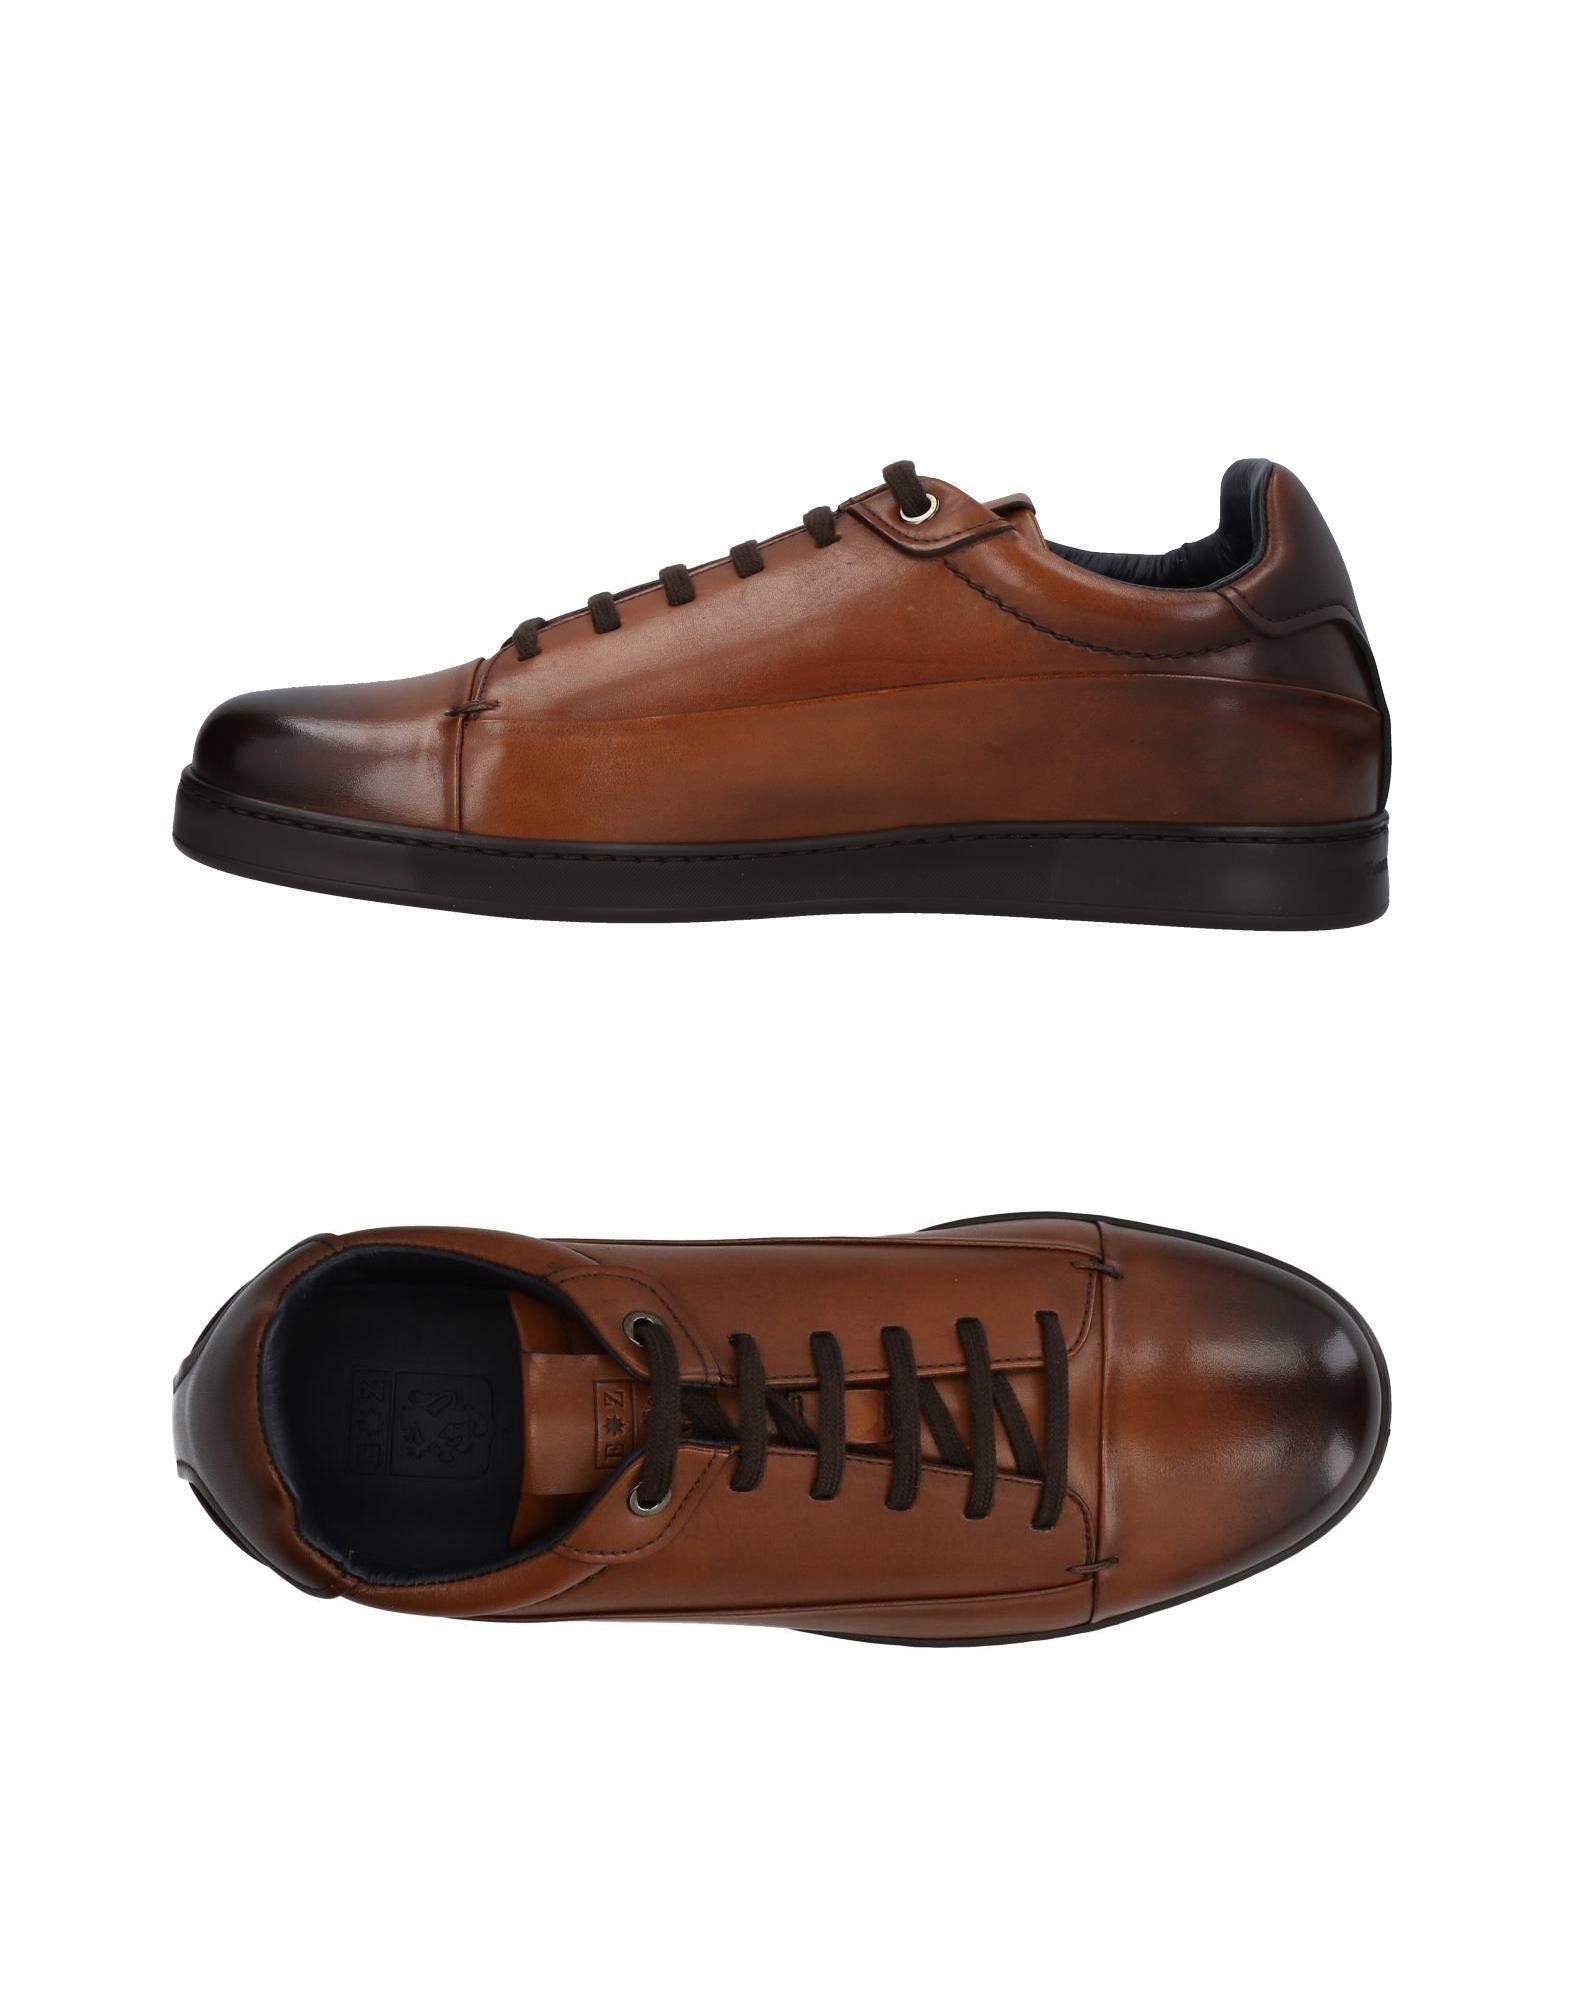 Ermenegildo Zegna Sneakers In Brown